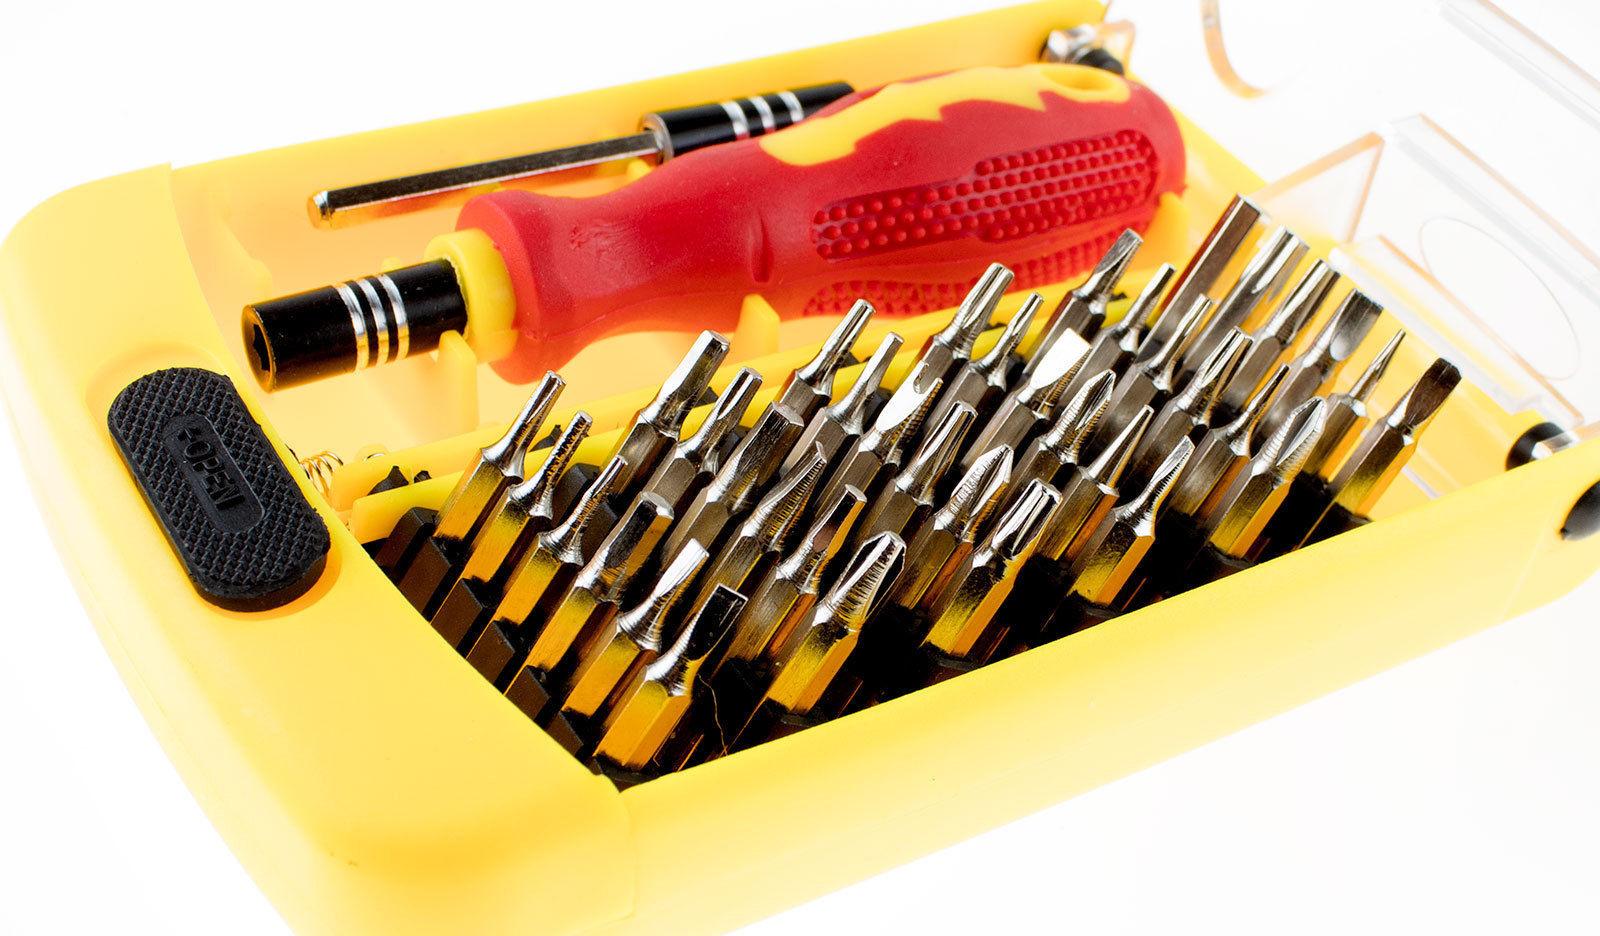 38in1 Precision Torx Screwdriver Tools Kit Set For Repair Electronics PC Laptop